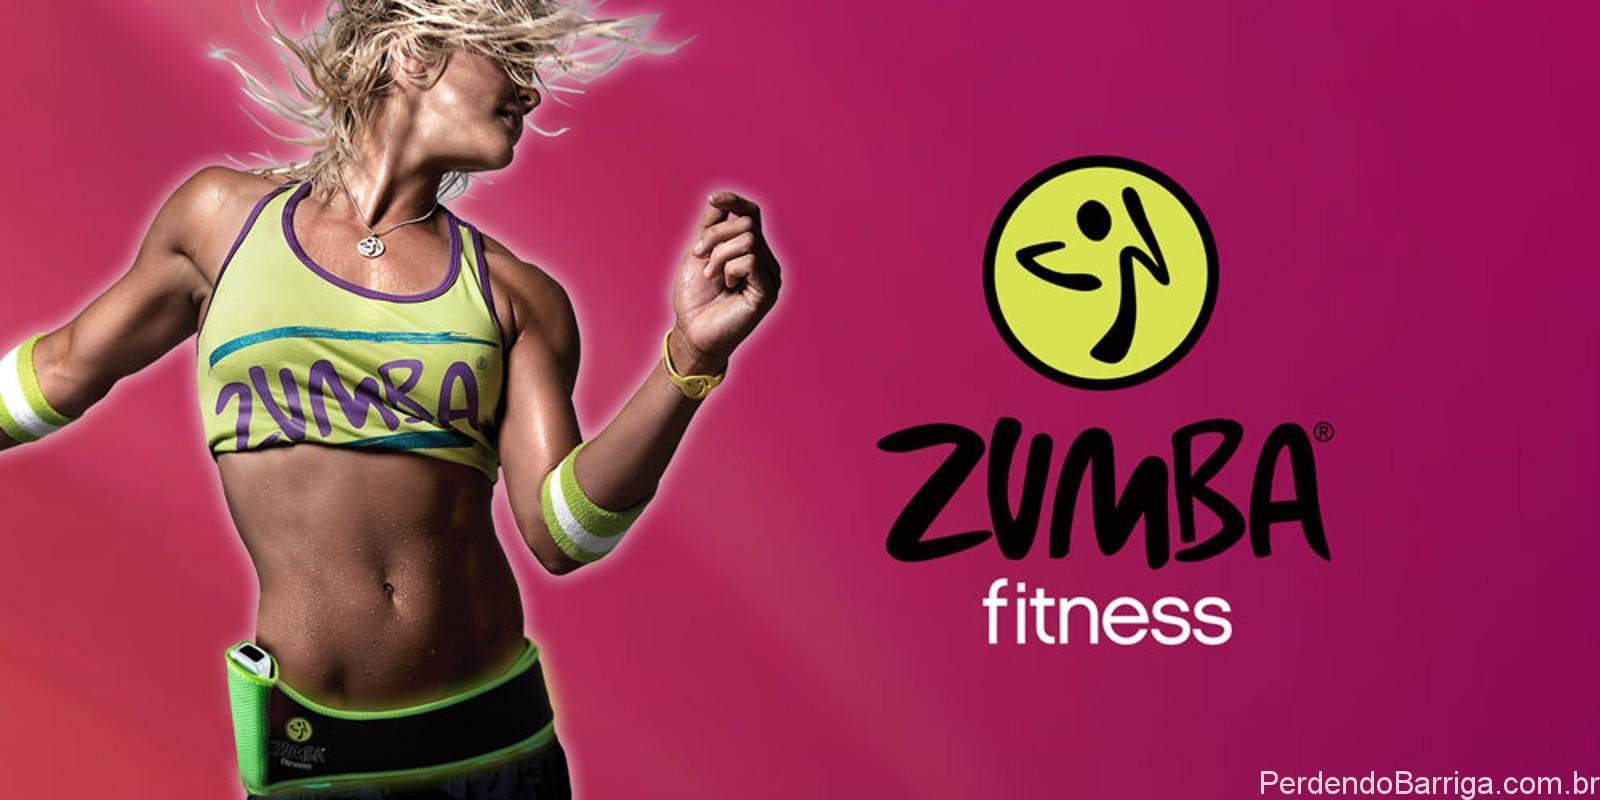 Zumba Fitness: Mulher dançando e logo da Zumba